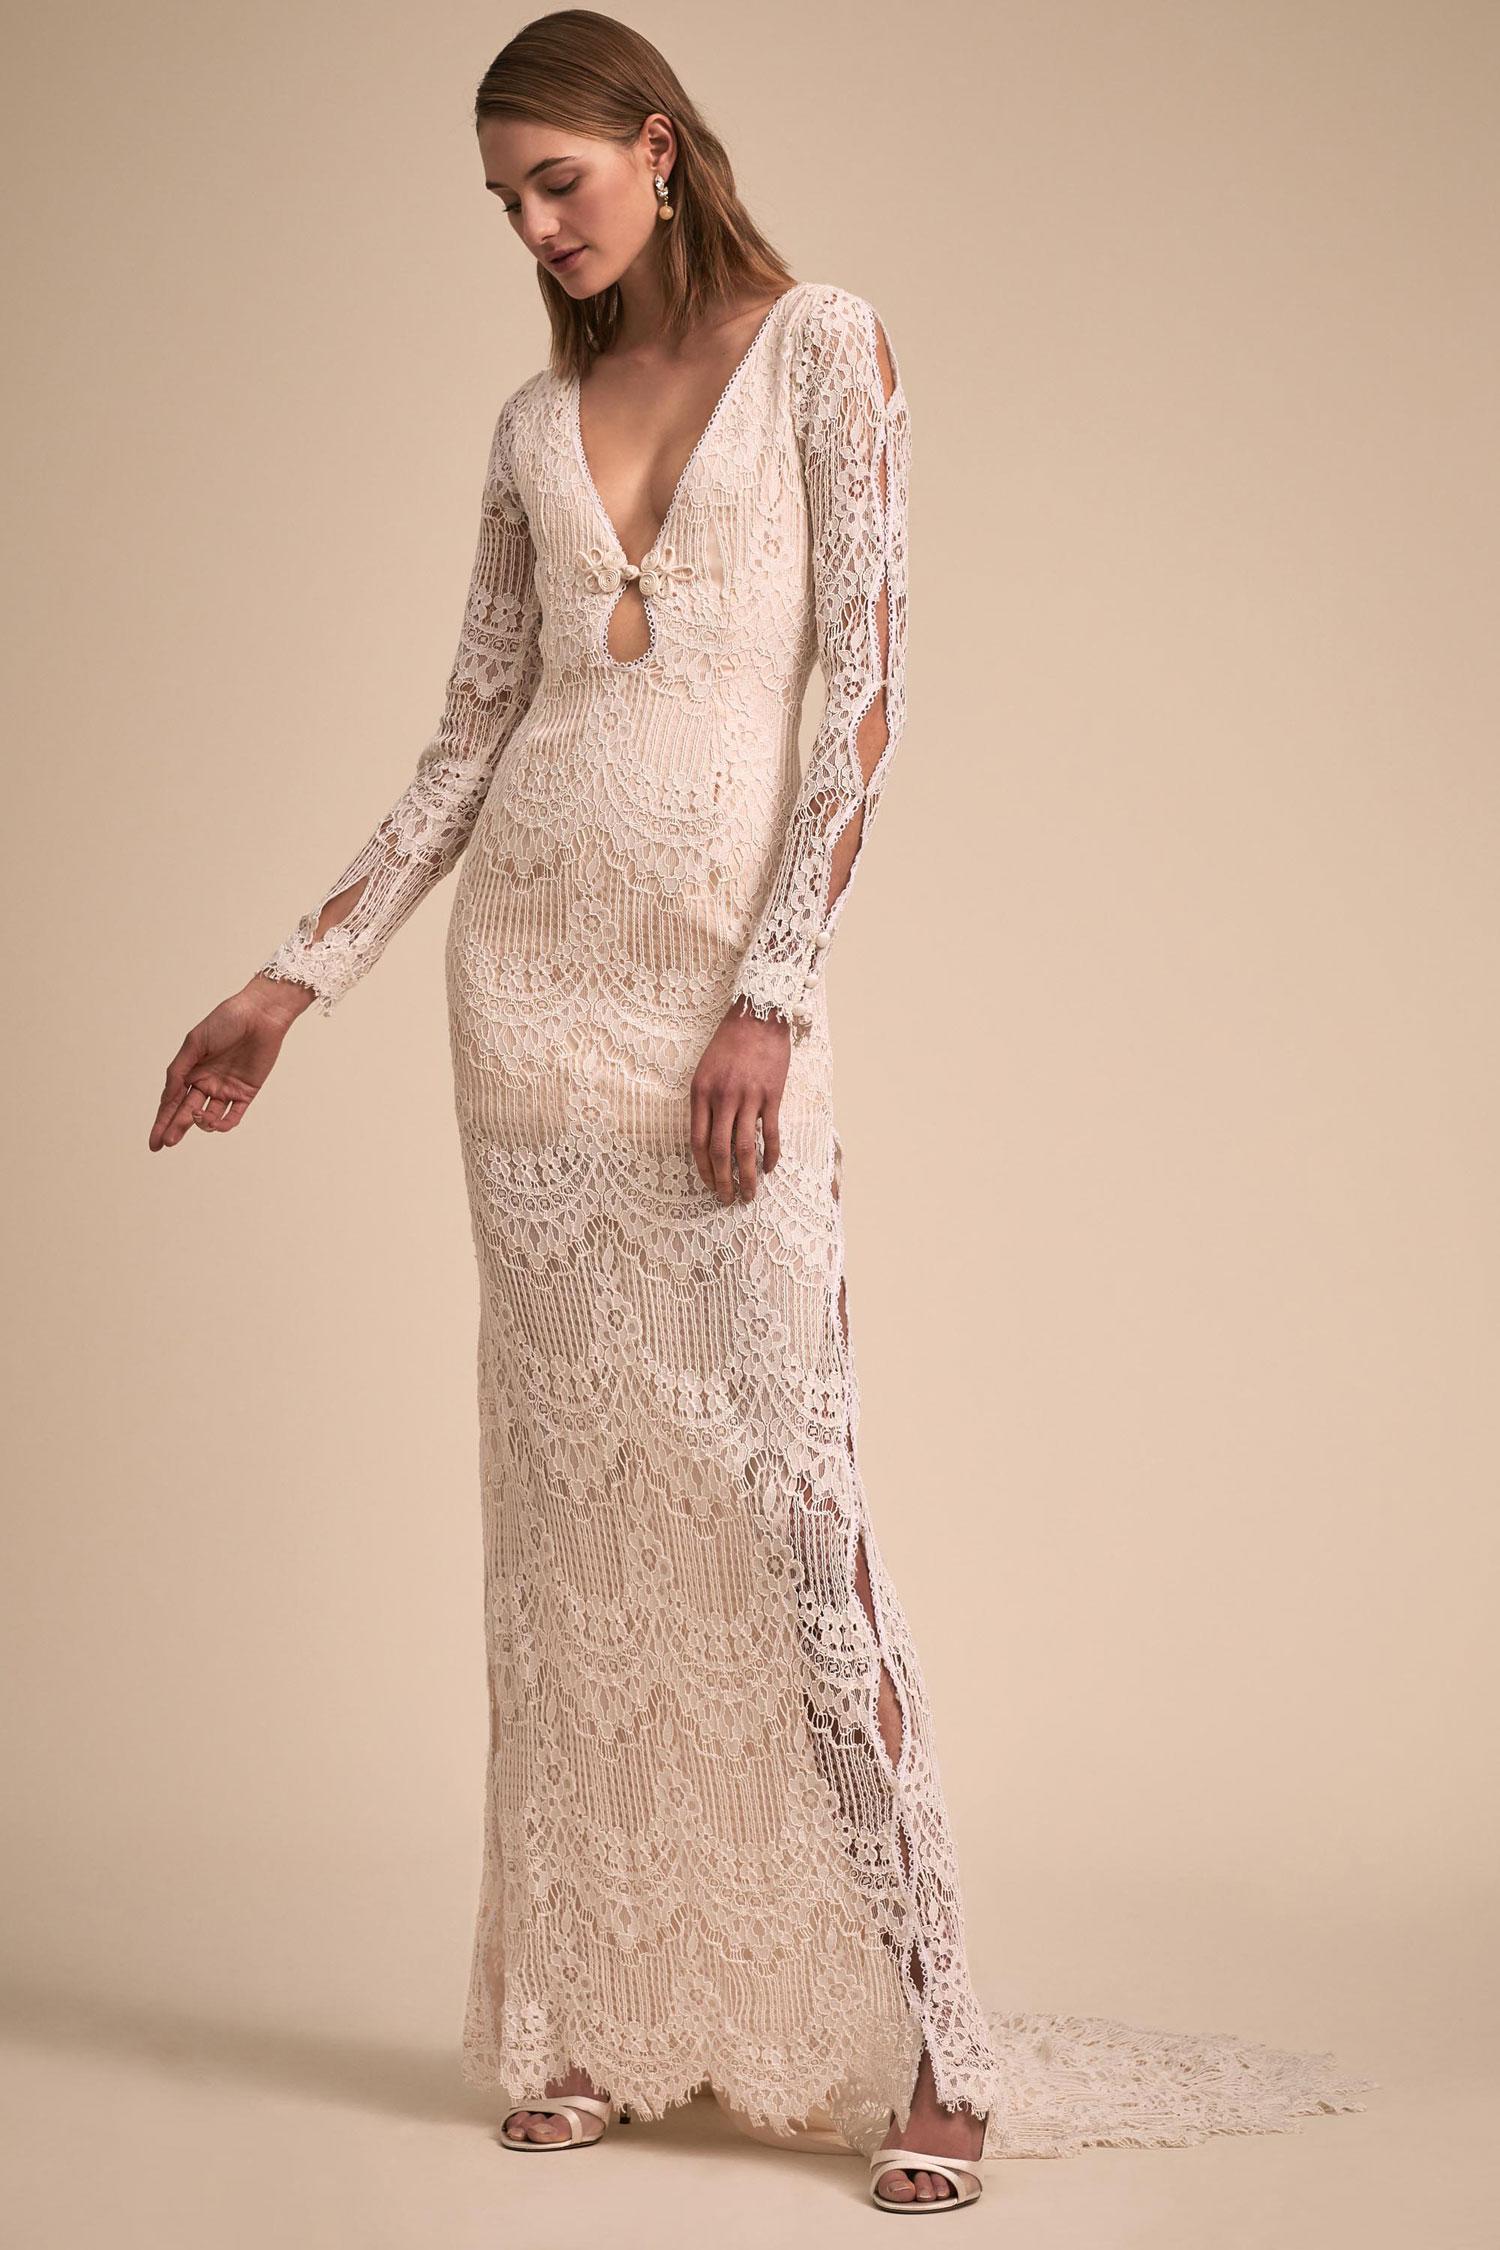 ee20bc9379 Designer Long Sleeve Lace Wedding Dresses – DACC